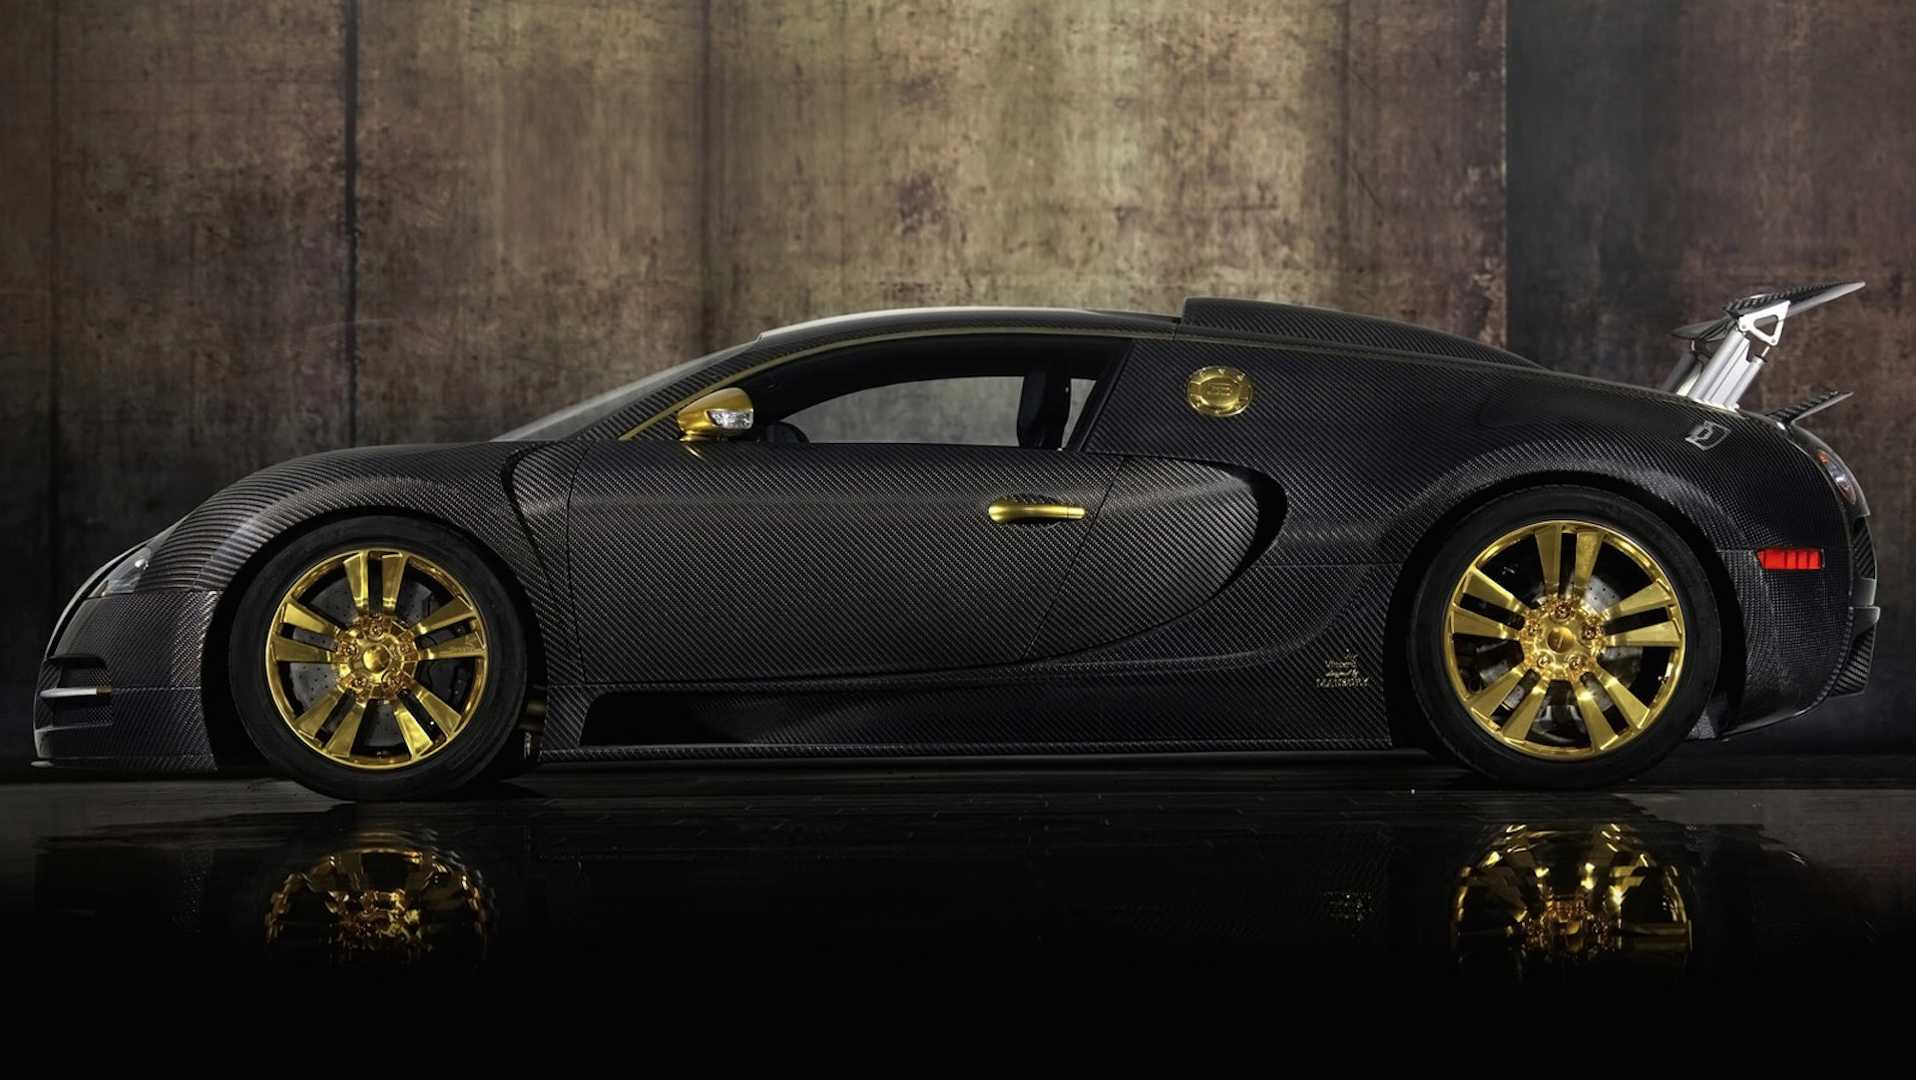 mansory-bugatti-veyron Modern Bugatti Veyron Price and Pictures Cars Trend